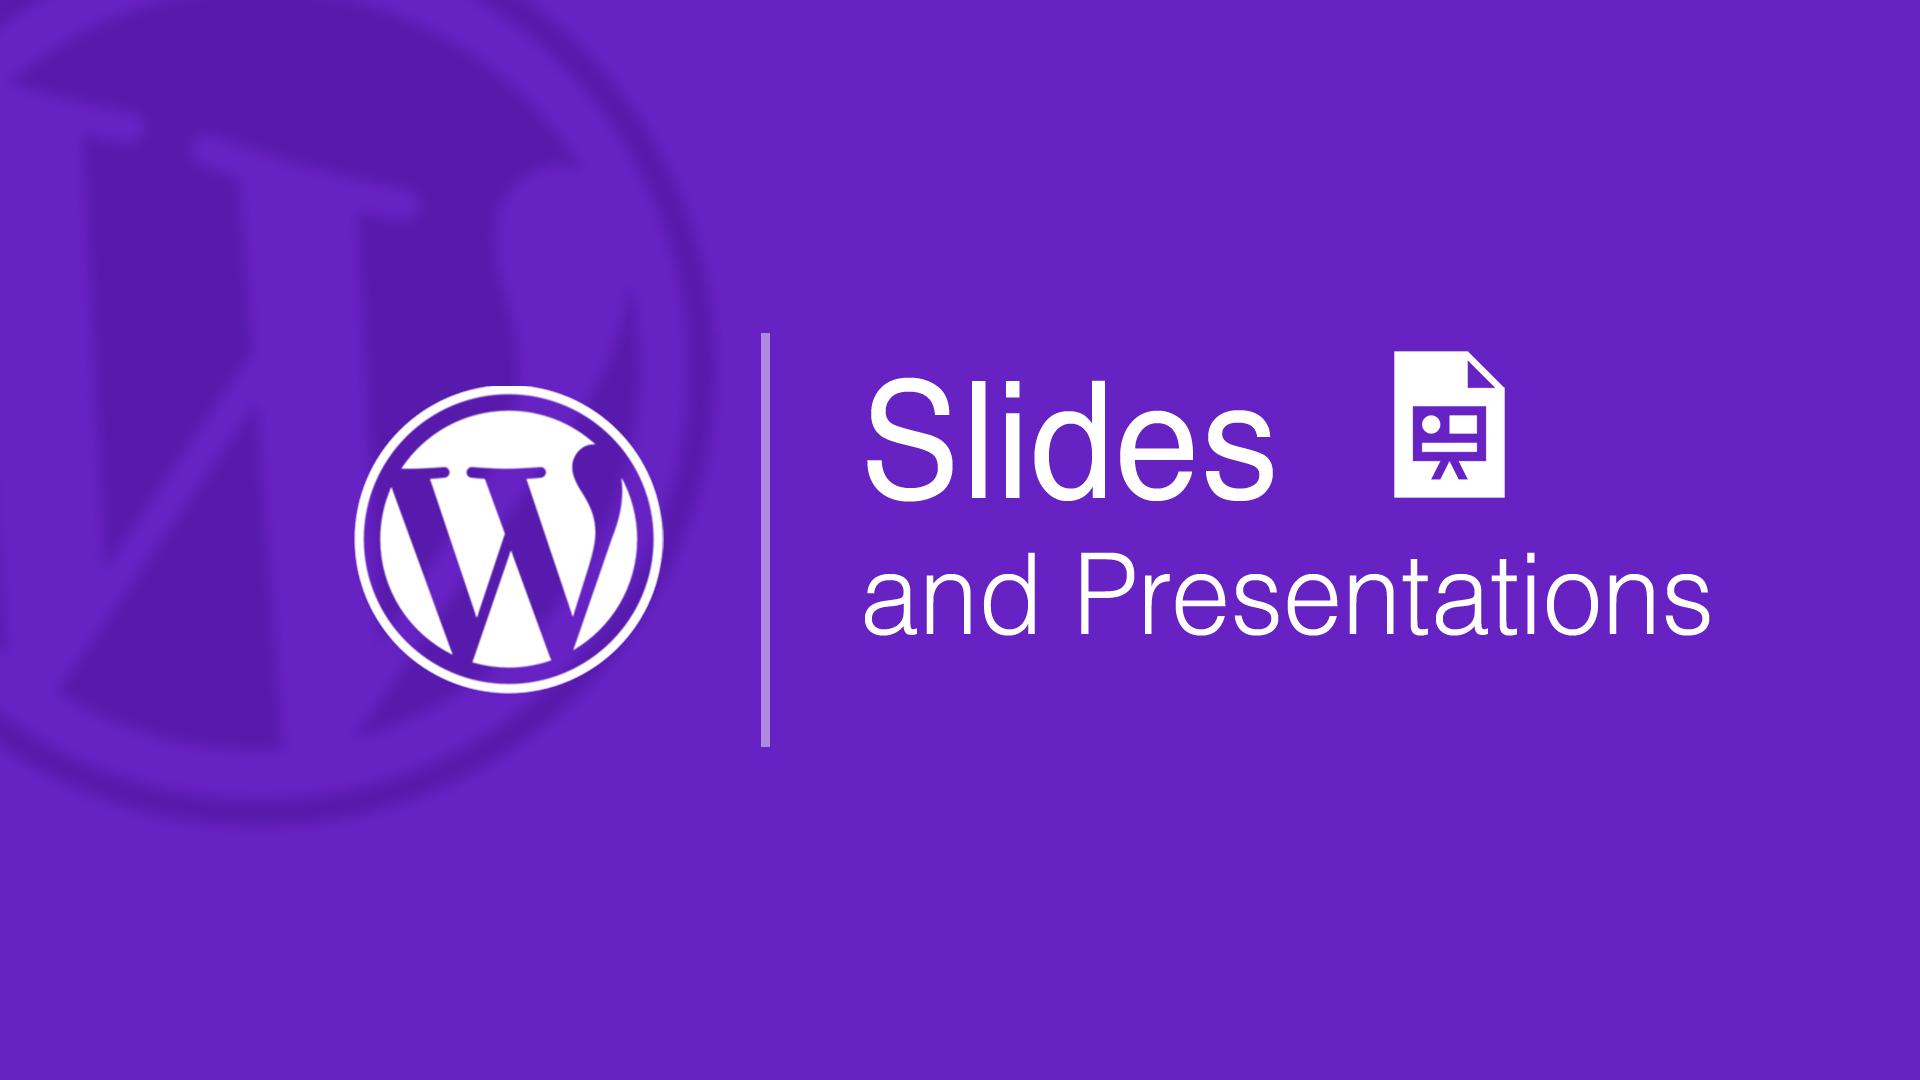 slides-and-presentations